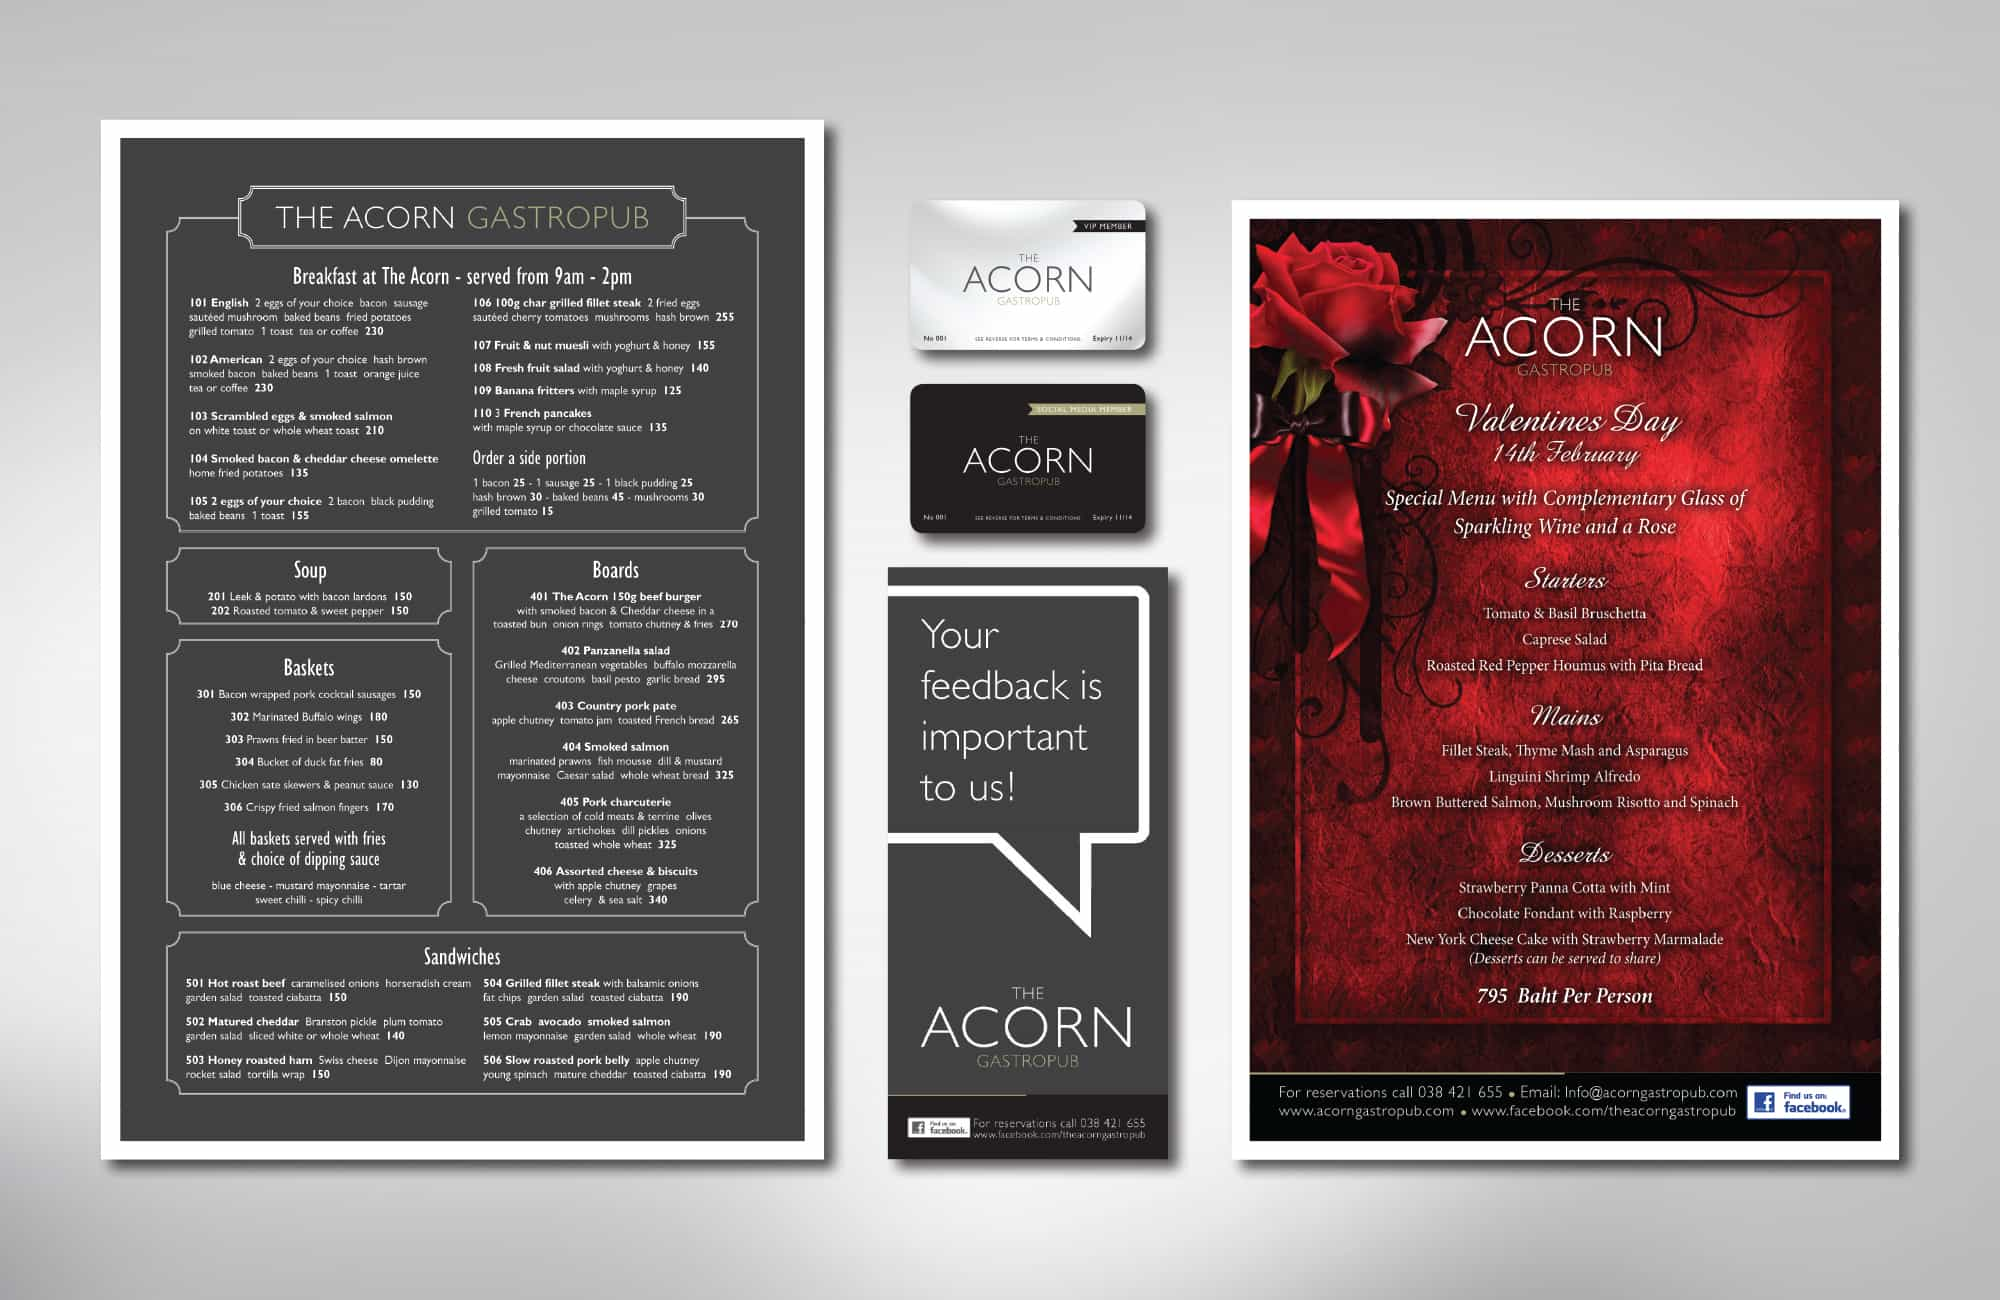 The Acorn Gastropub